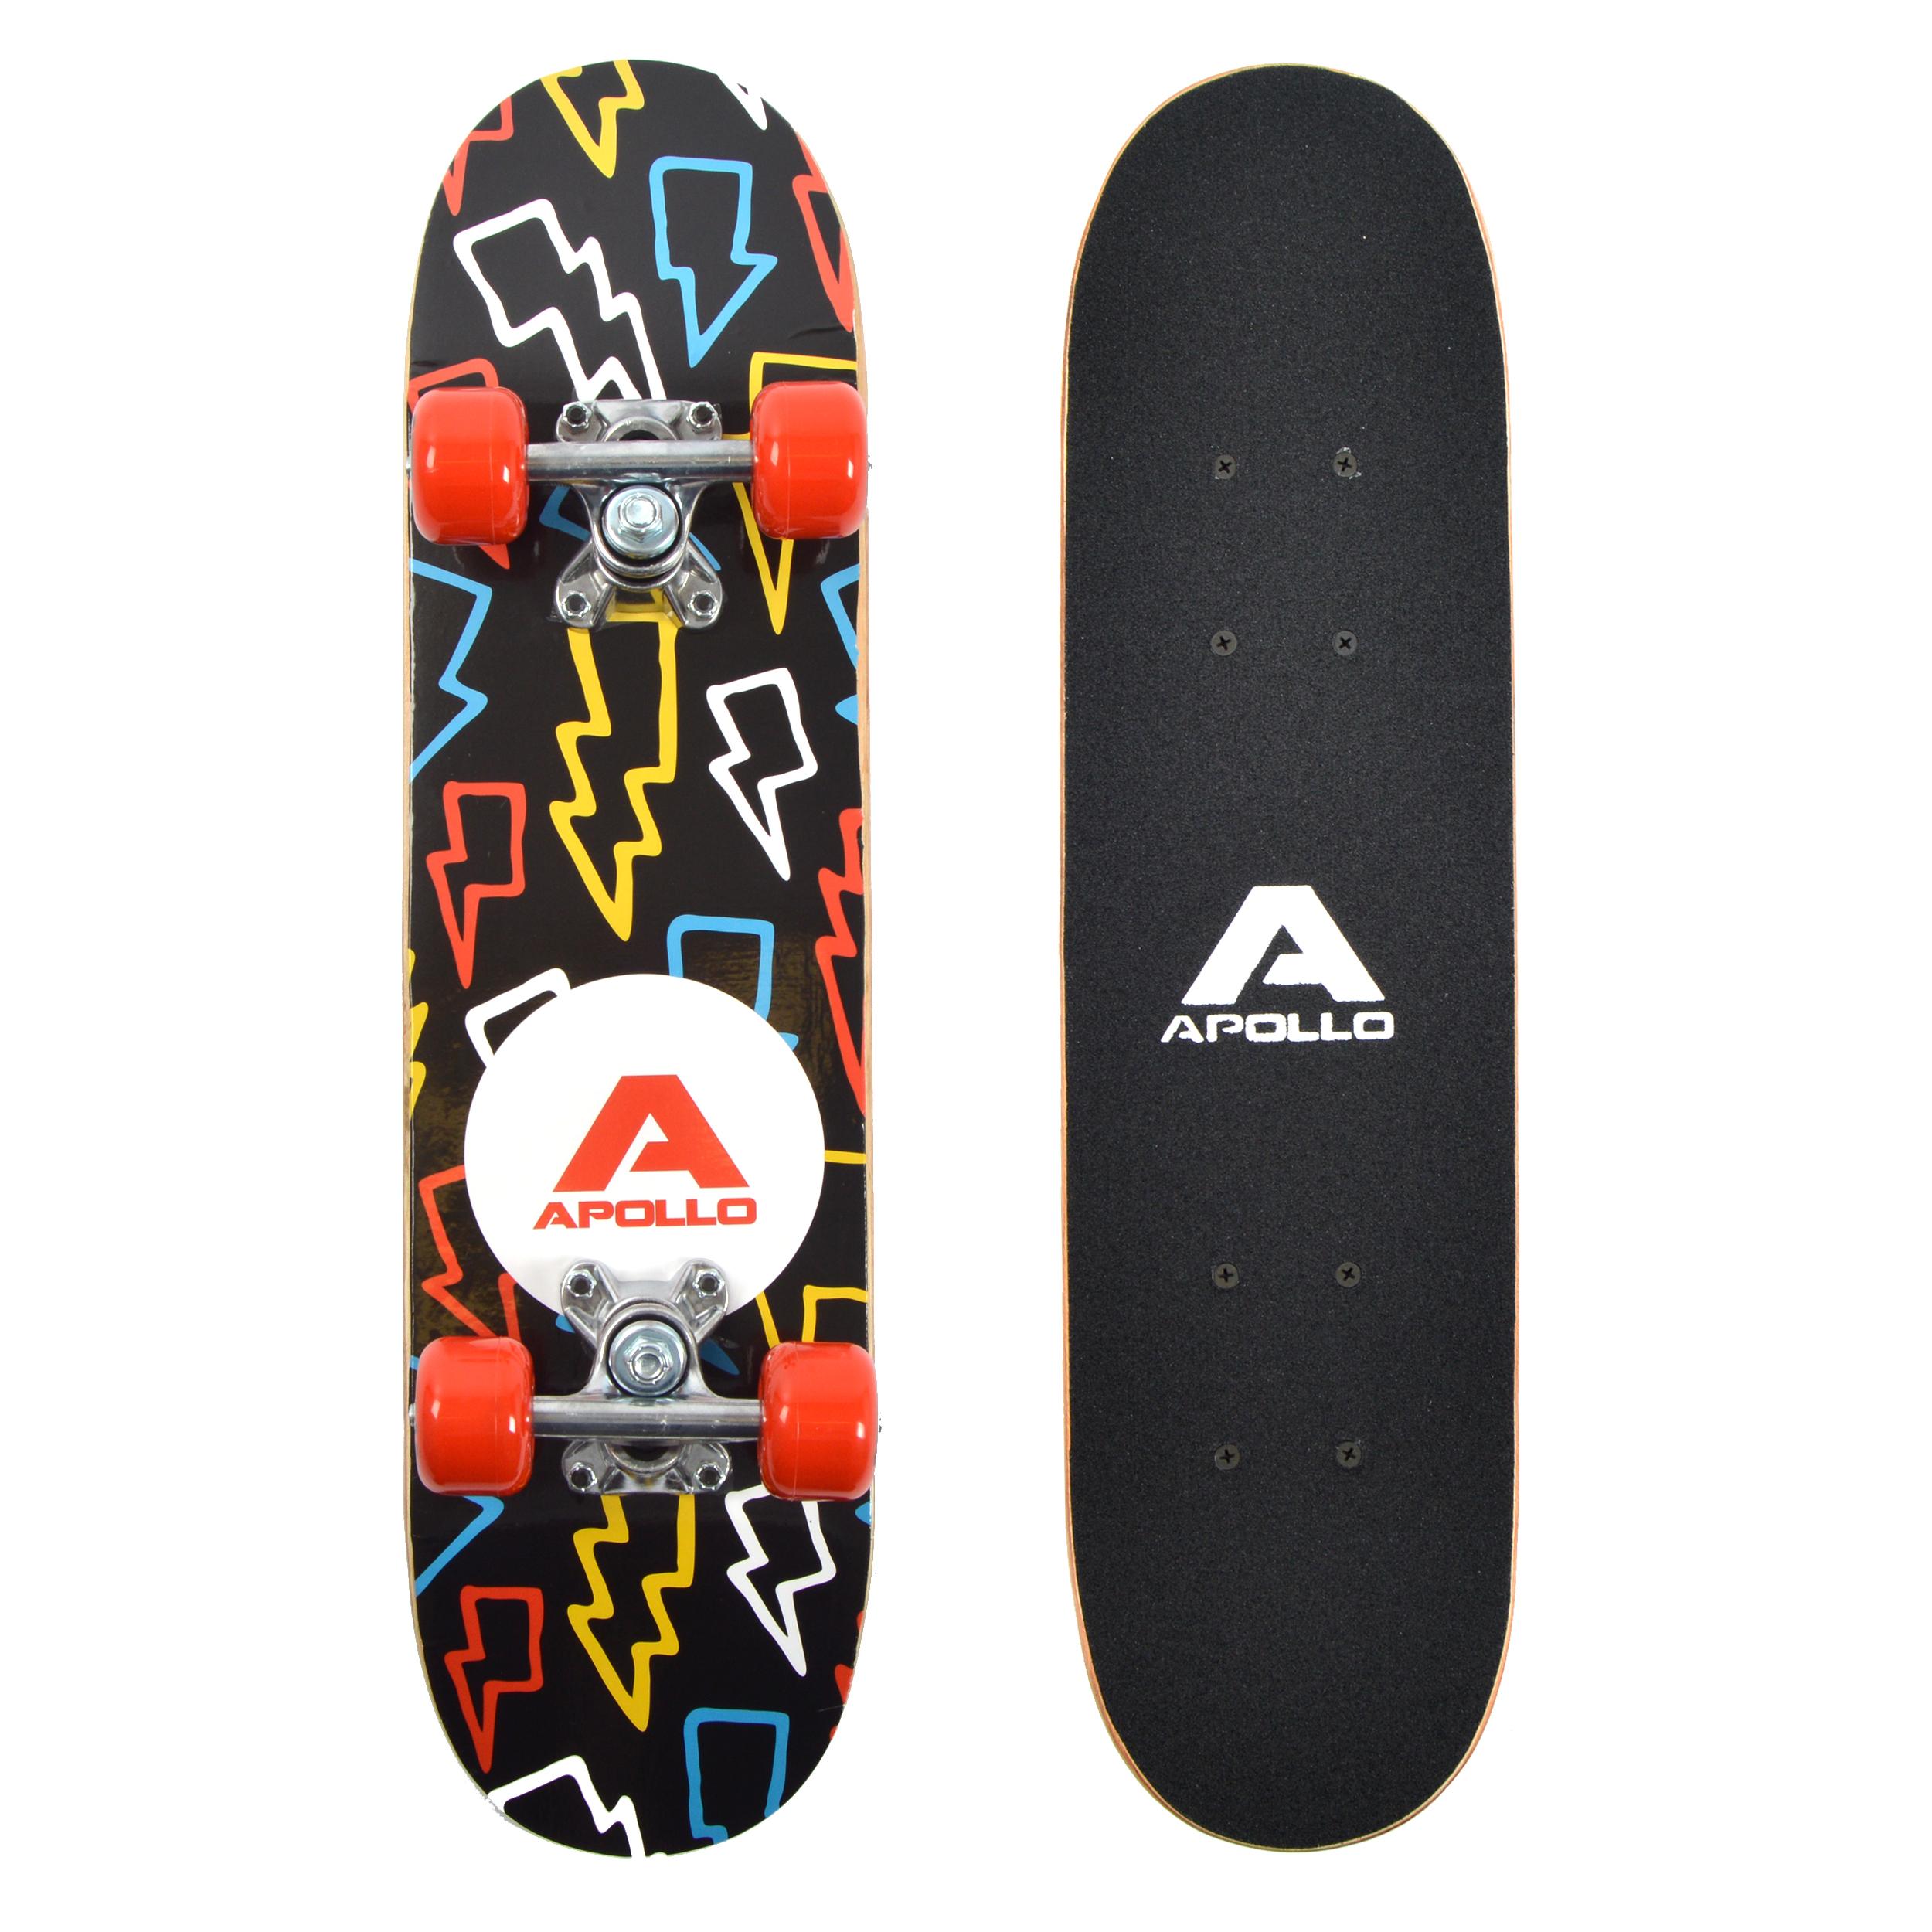 apollo kinderskateboards funboards in verschiedenen. Black Bedroom Furniture Sets. Home Design Ideas